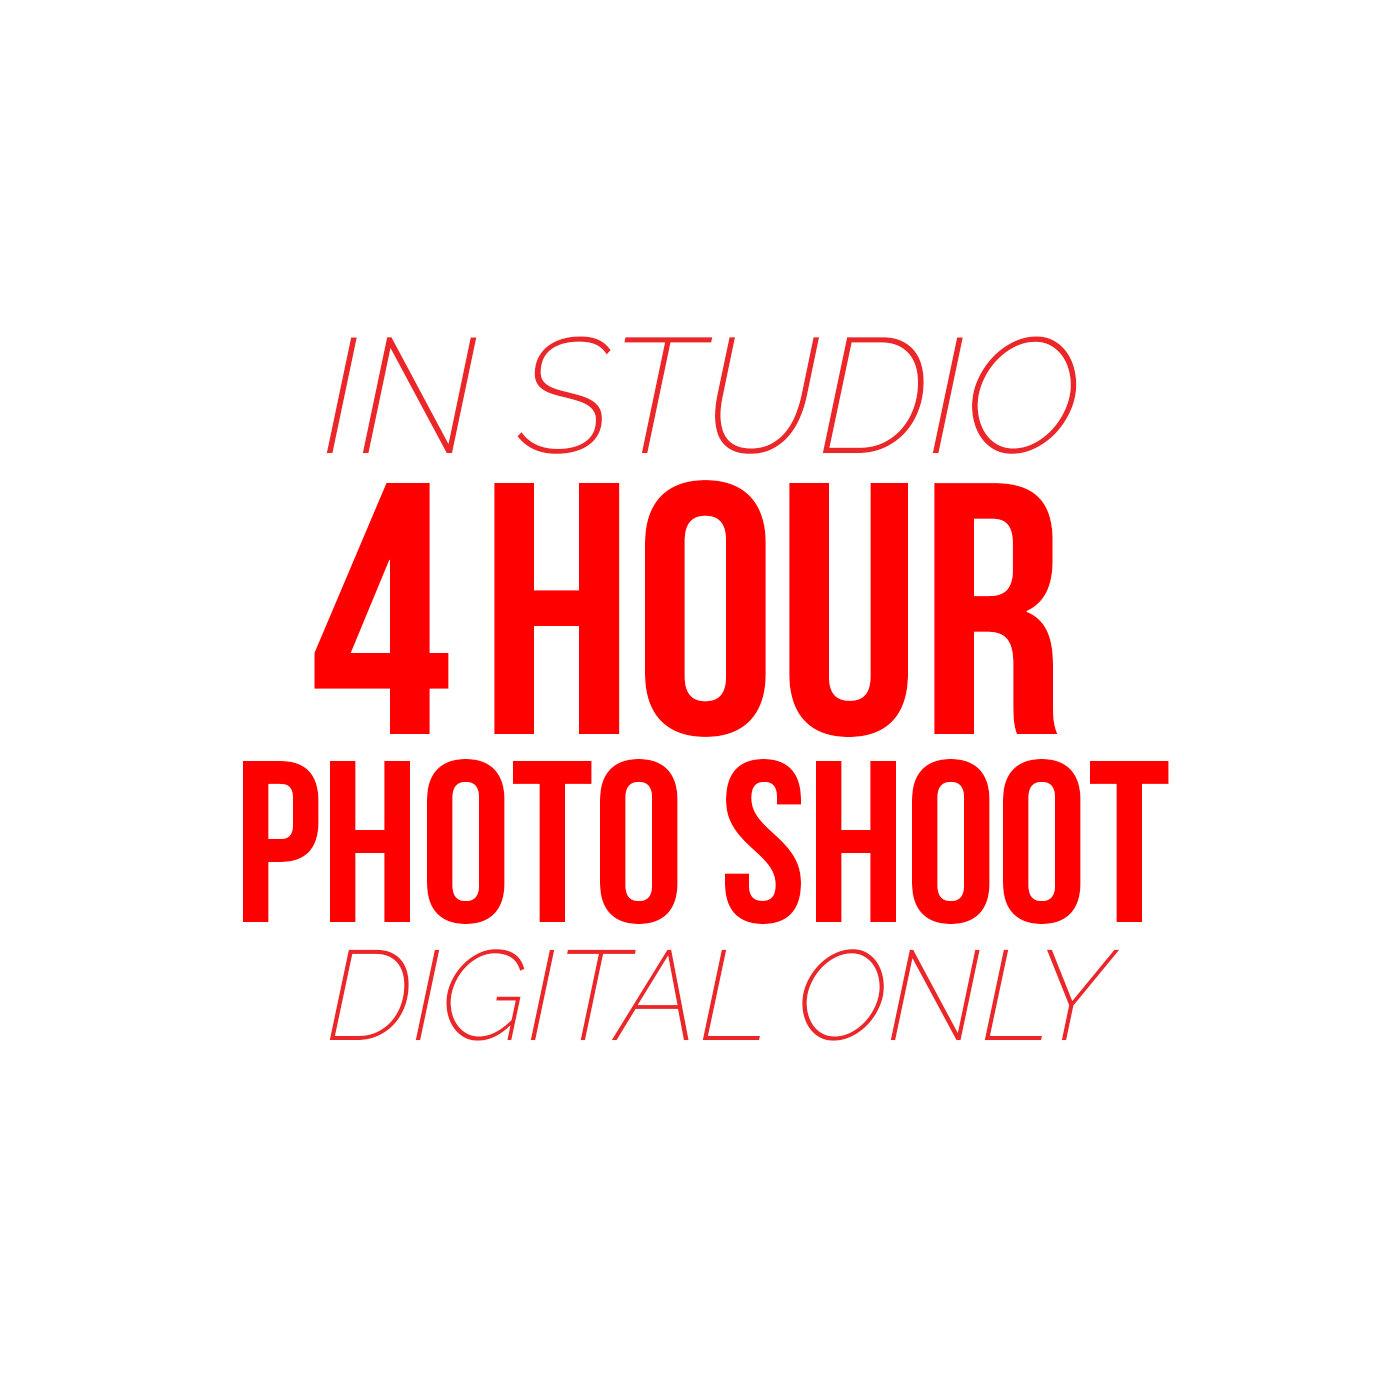 4 Hour Photo Shoot